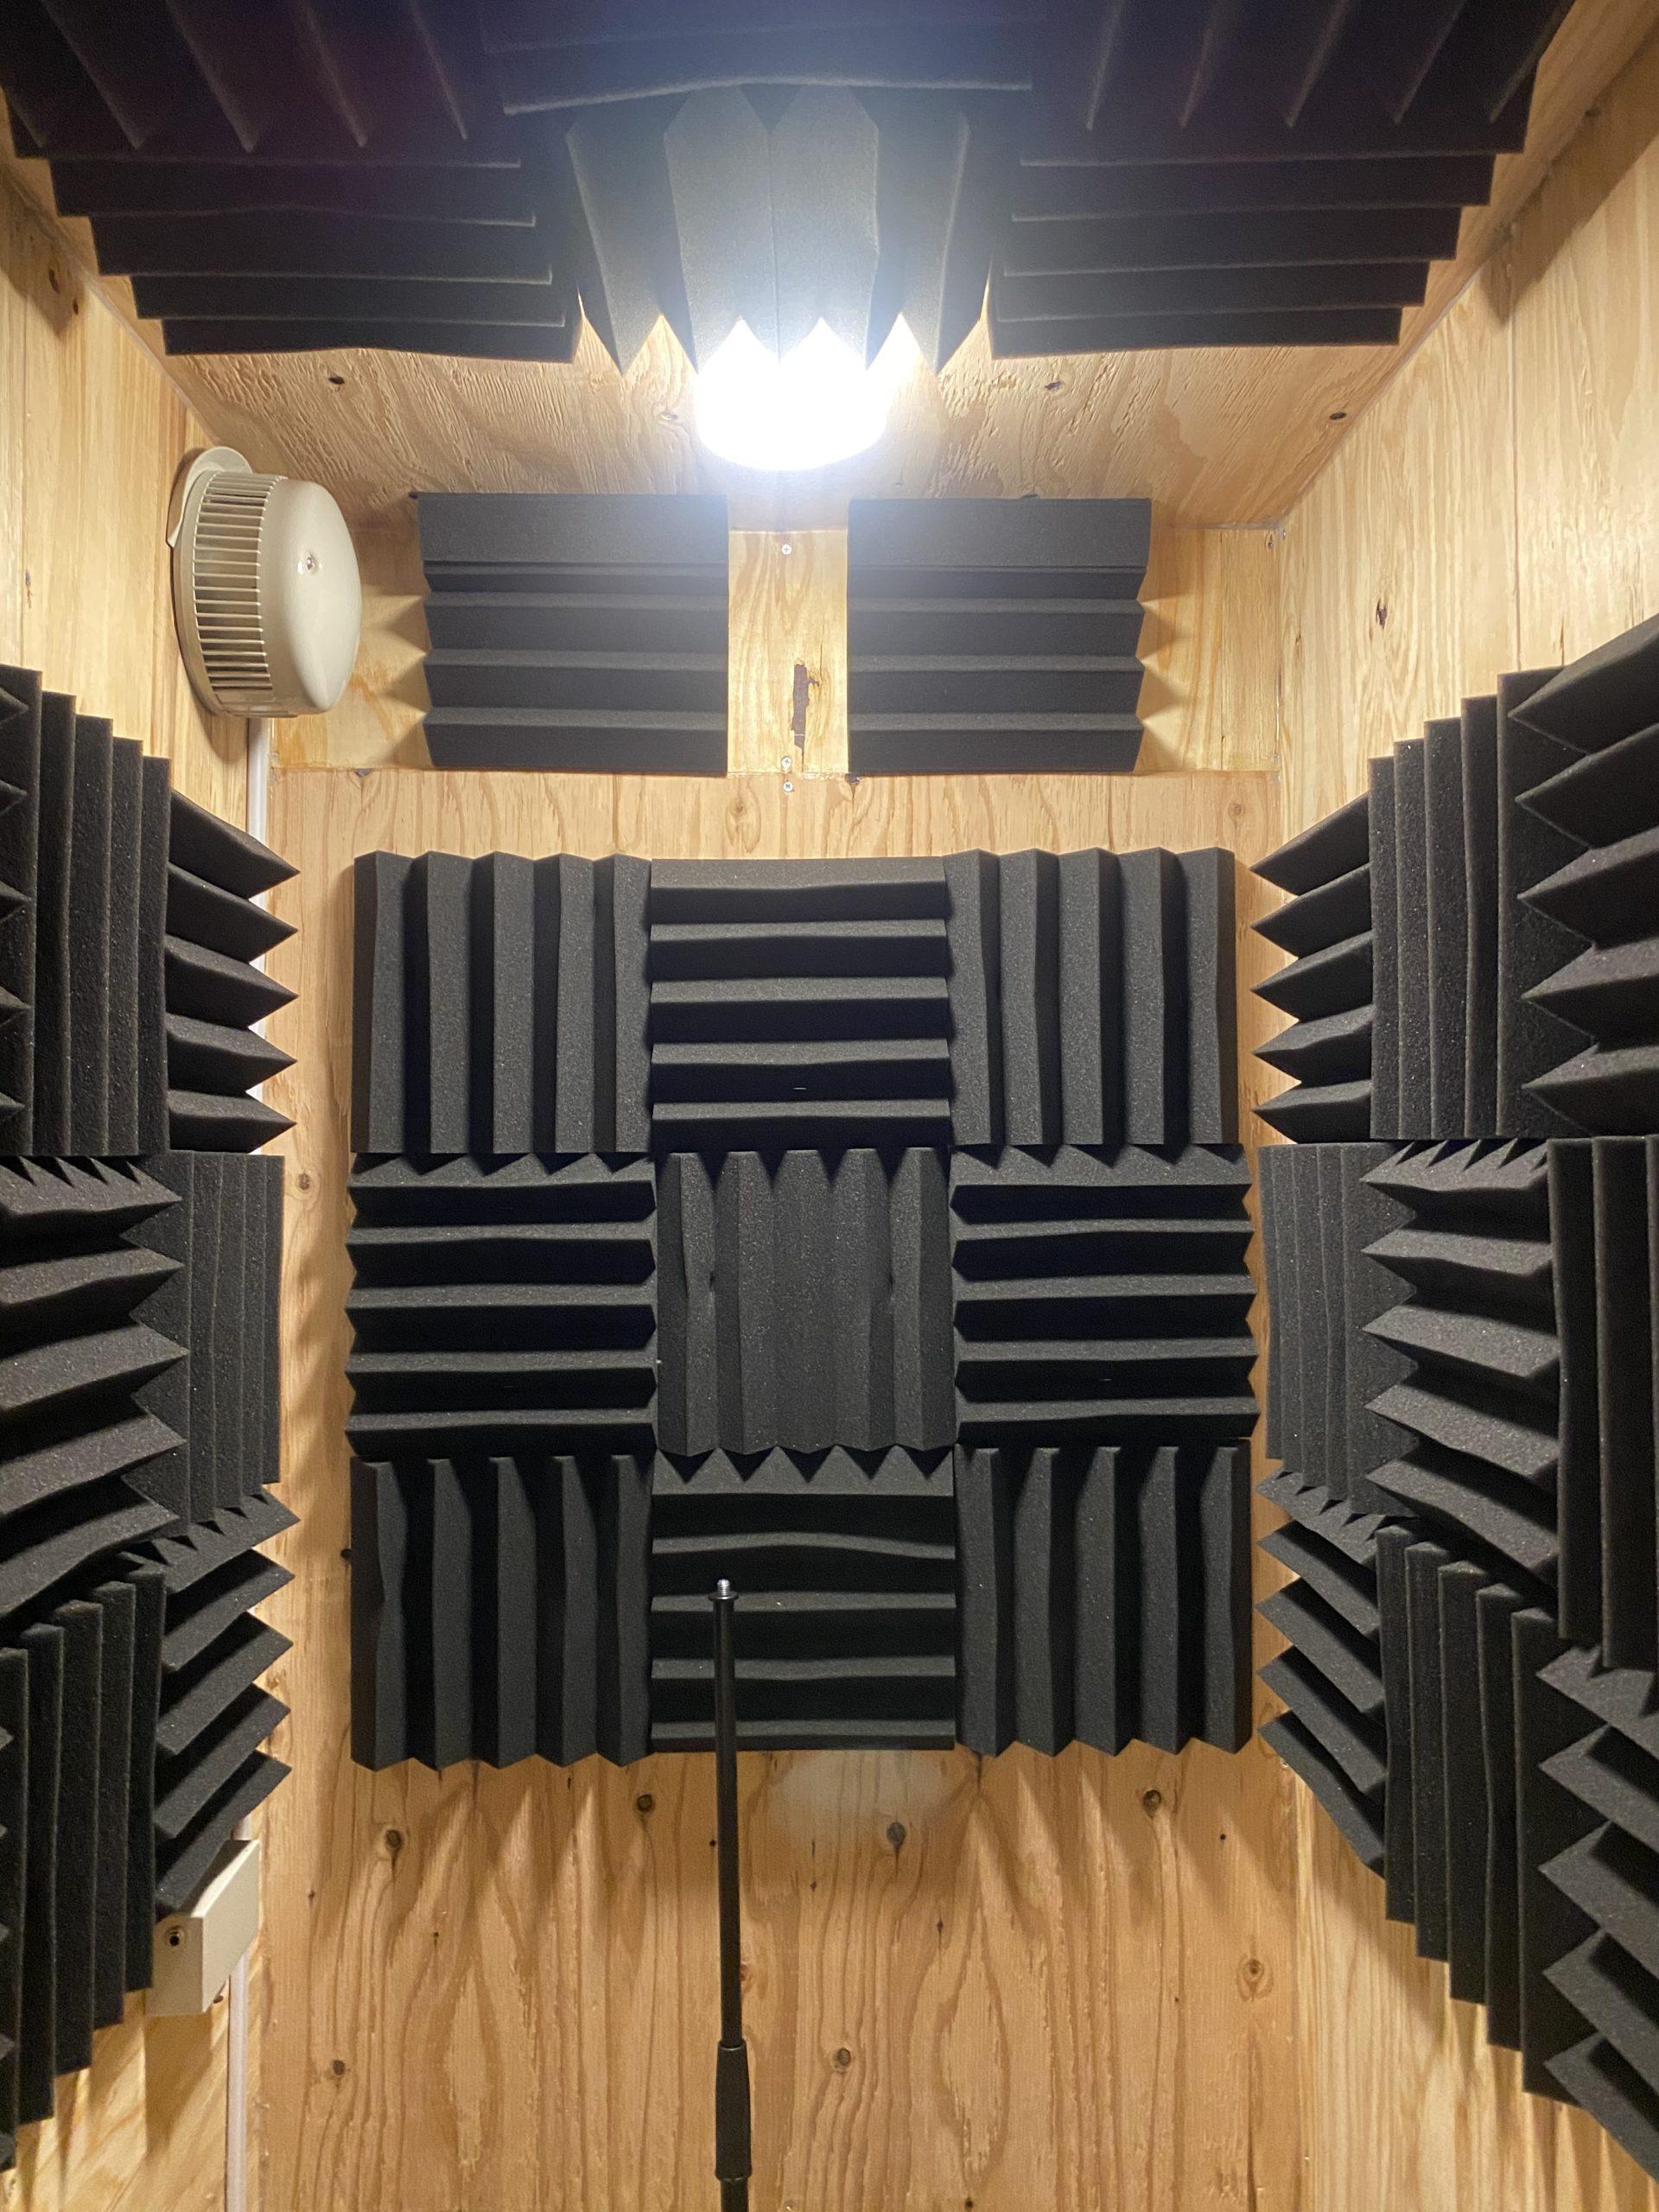 【DIYで防音室自作!】ダイジェスト版。レコーディング用、練習用のボーカルブースを自作!賃貸マンションに録音環境を!